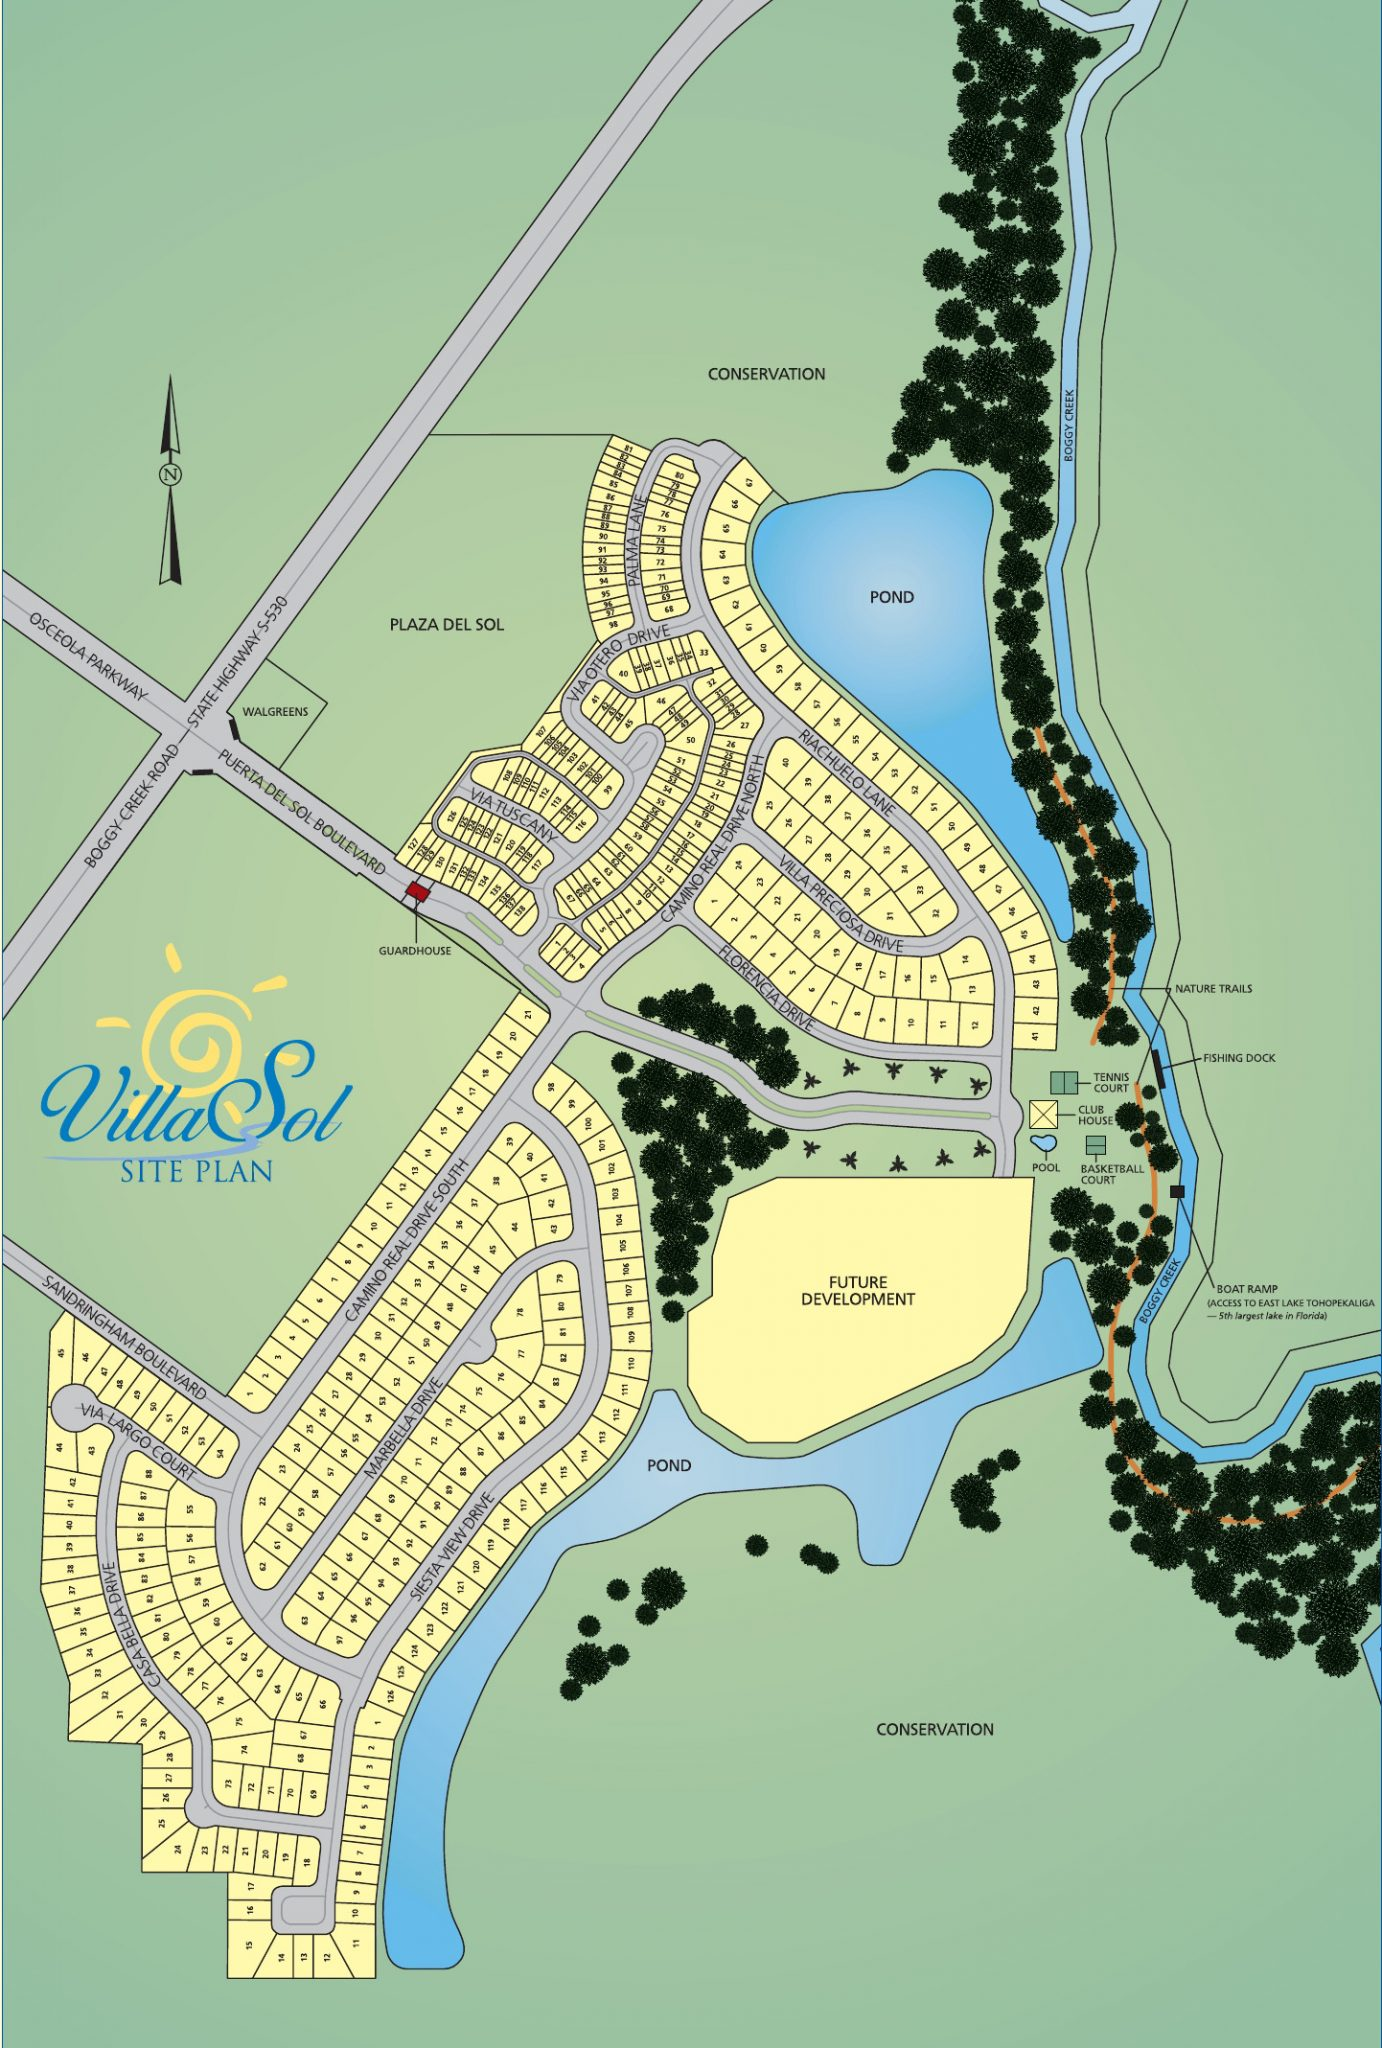 Map Of Kissimmee Florida.Elate Plan 3090 Villasol New Homes Kissimmee Fl Rey Homes